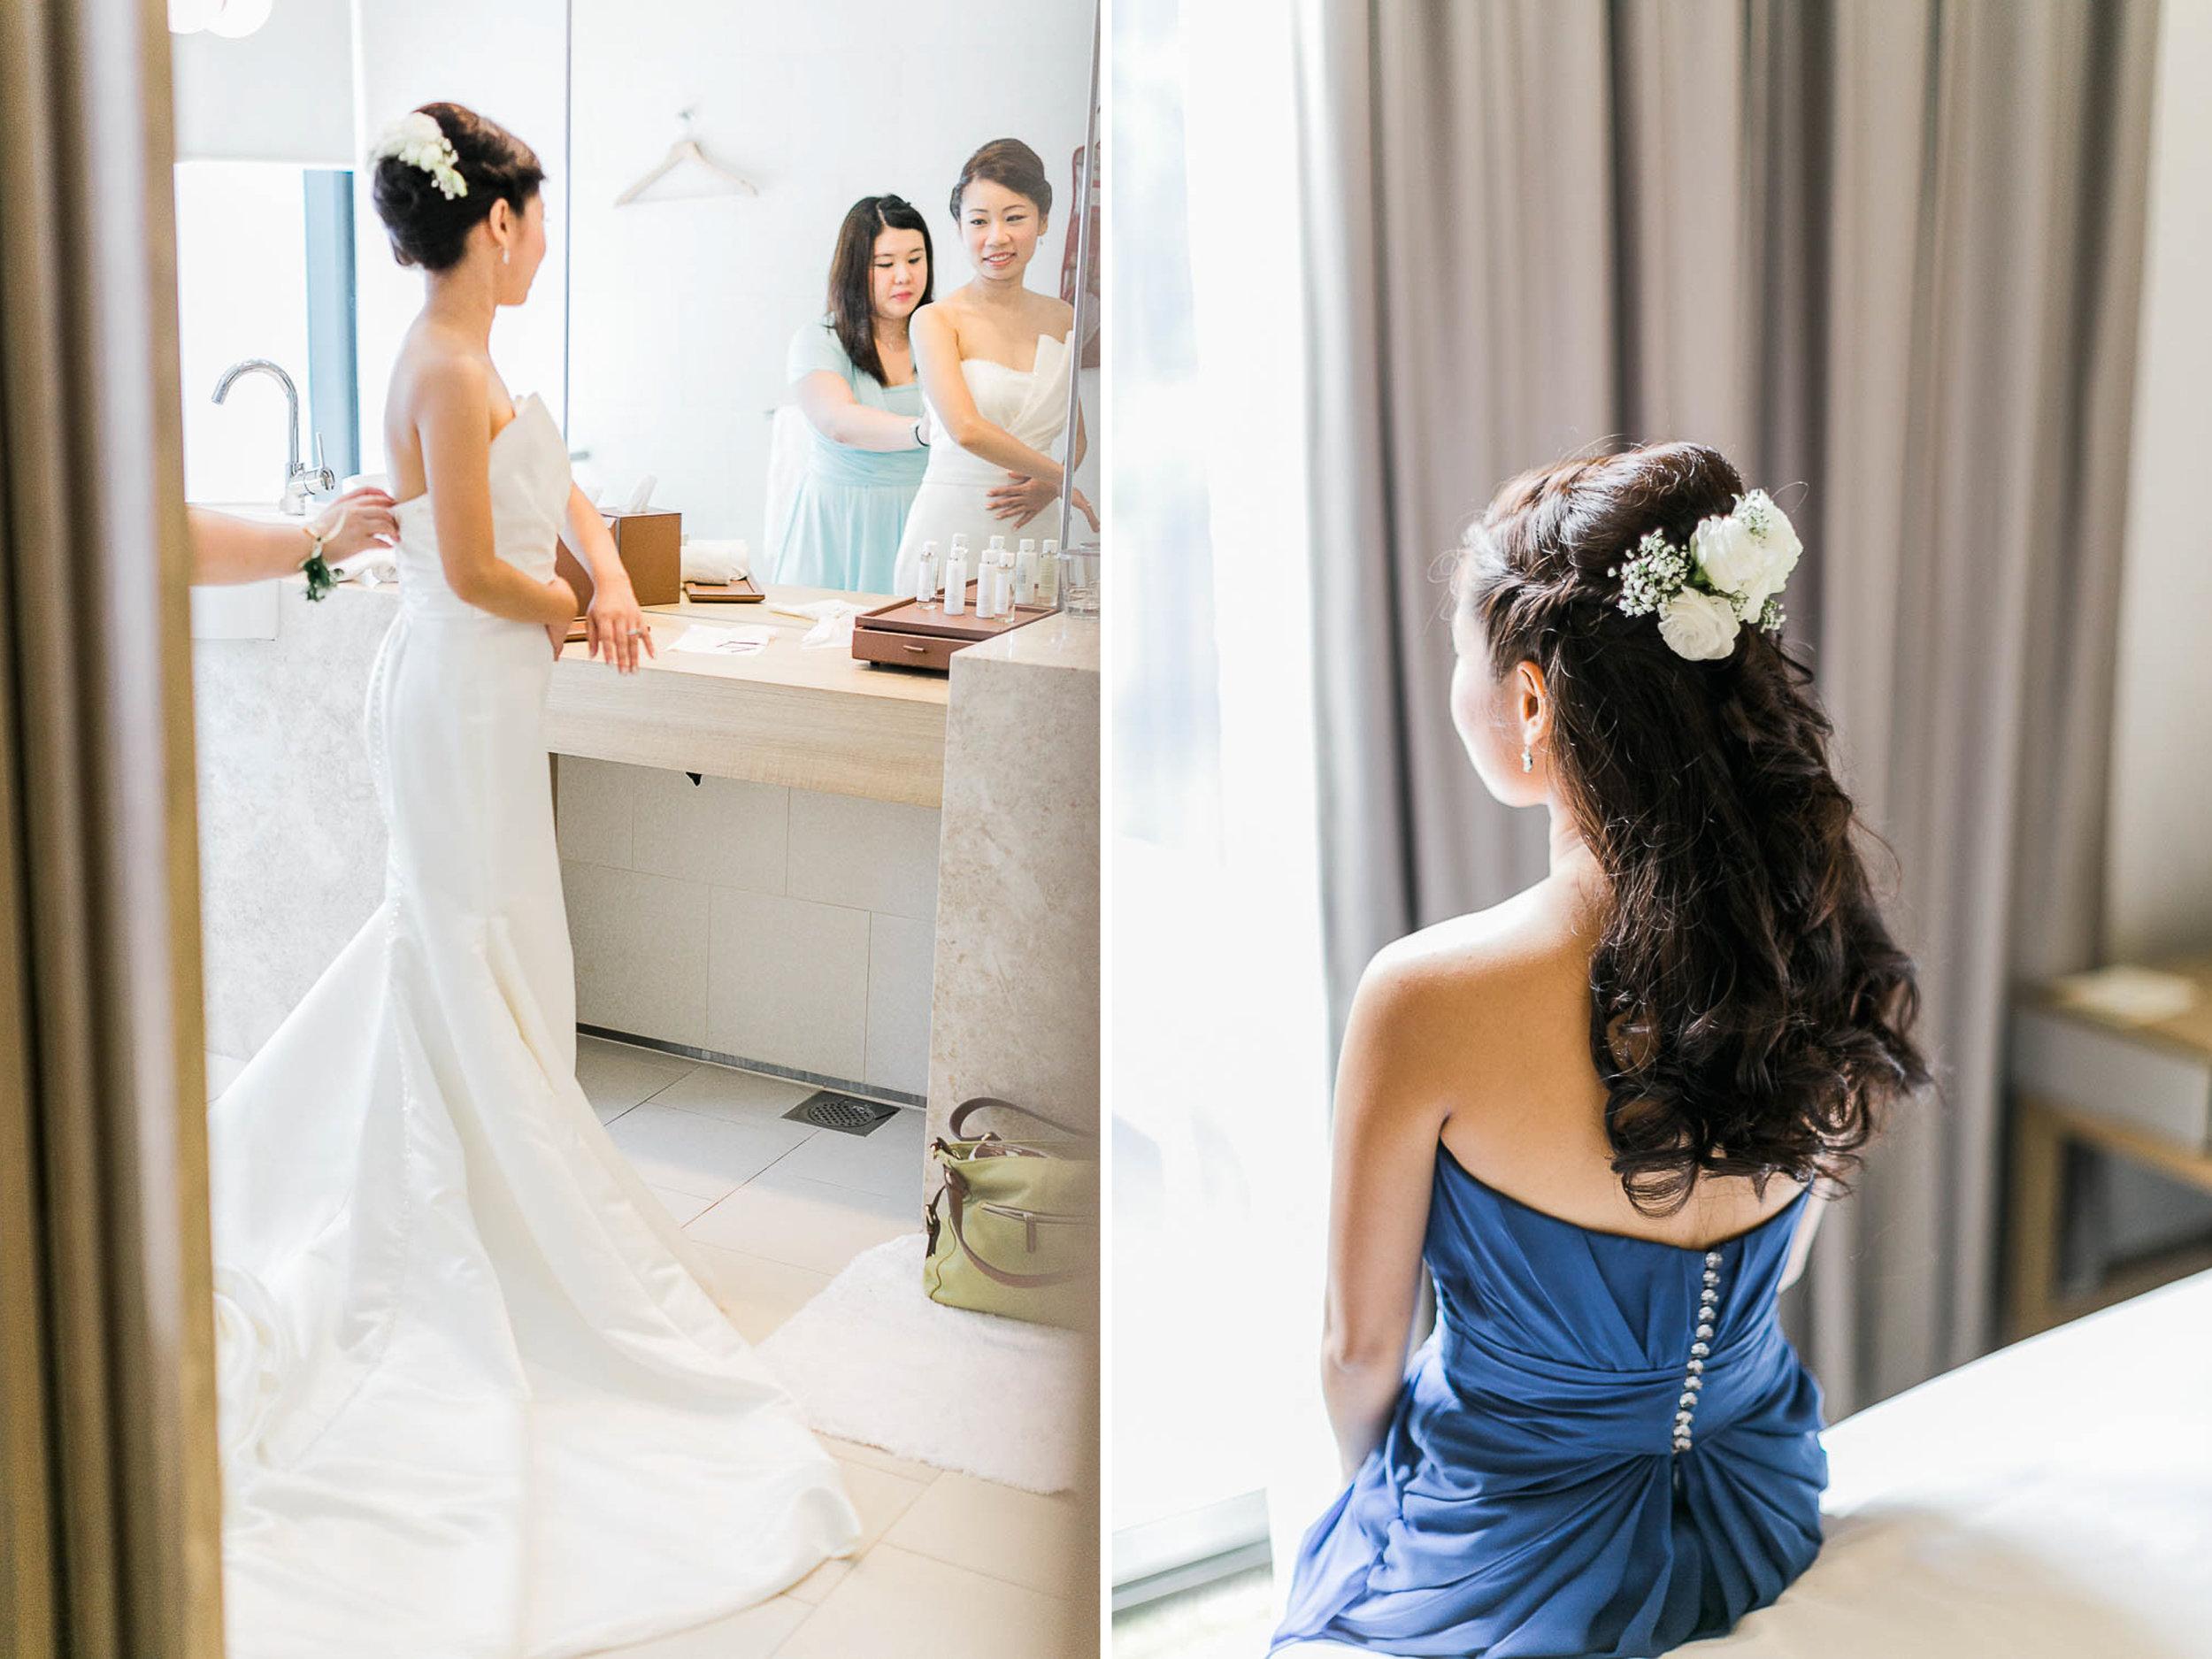 wedding-photographer-singapore-film-photographer-chen-sands-MinKang-wedding-3.jpg